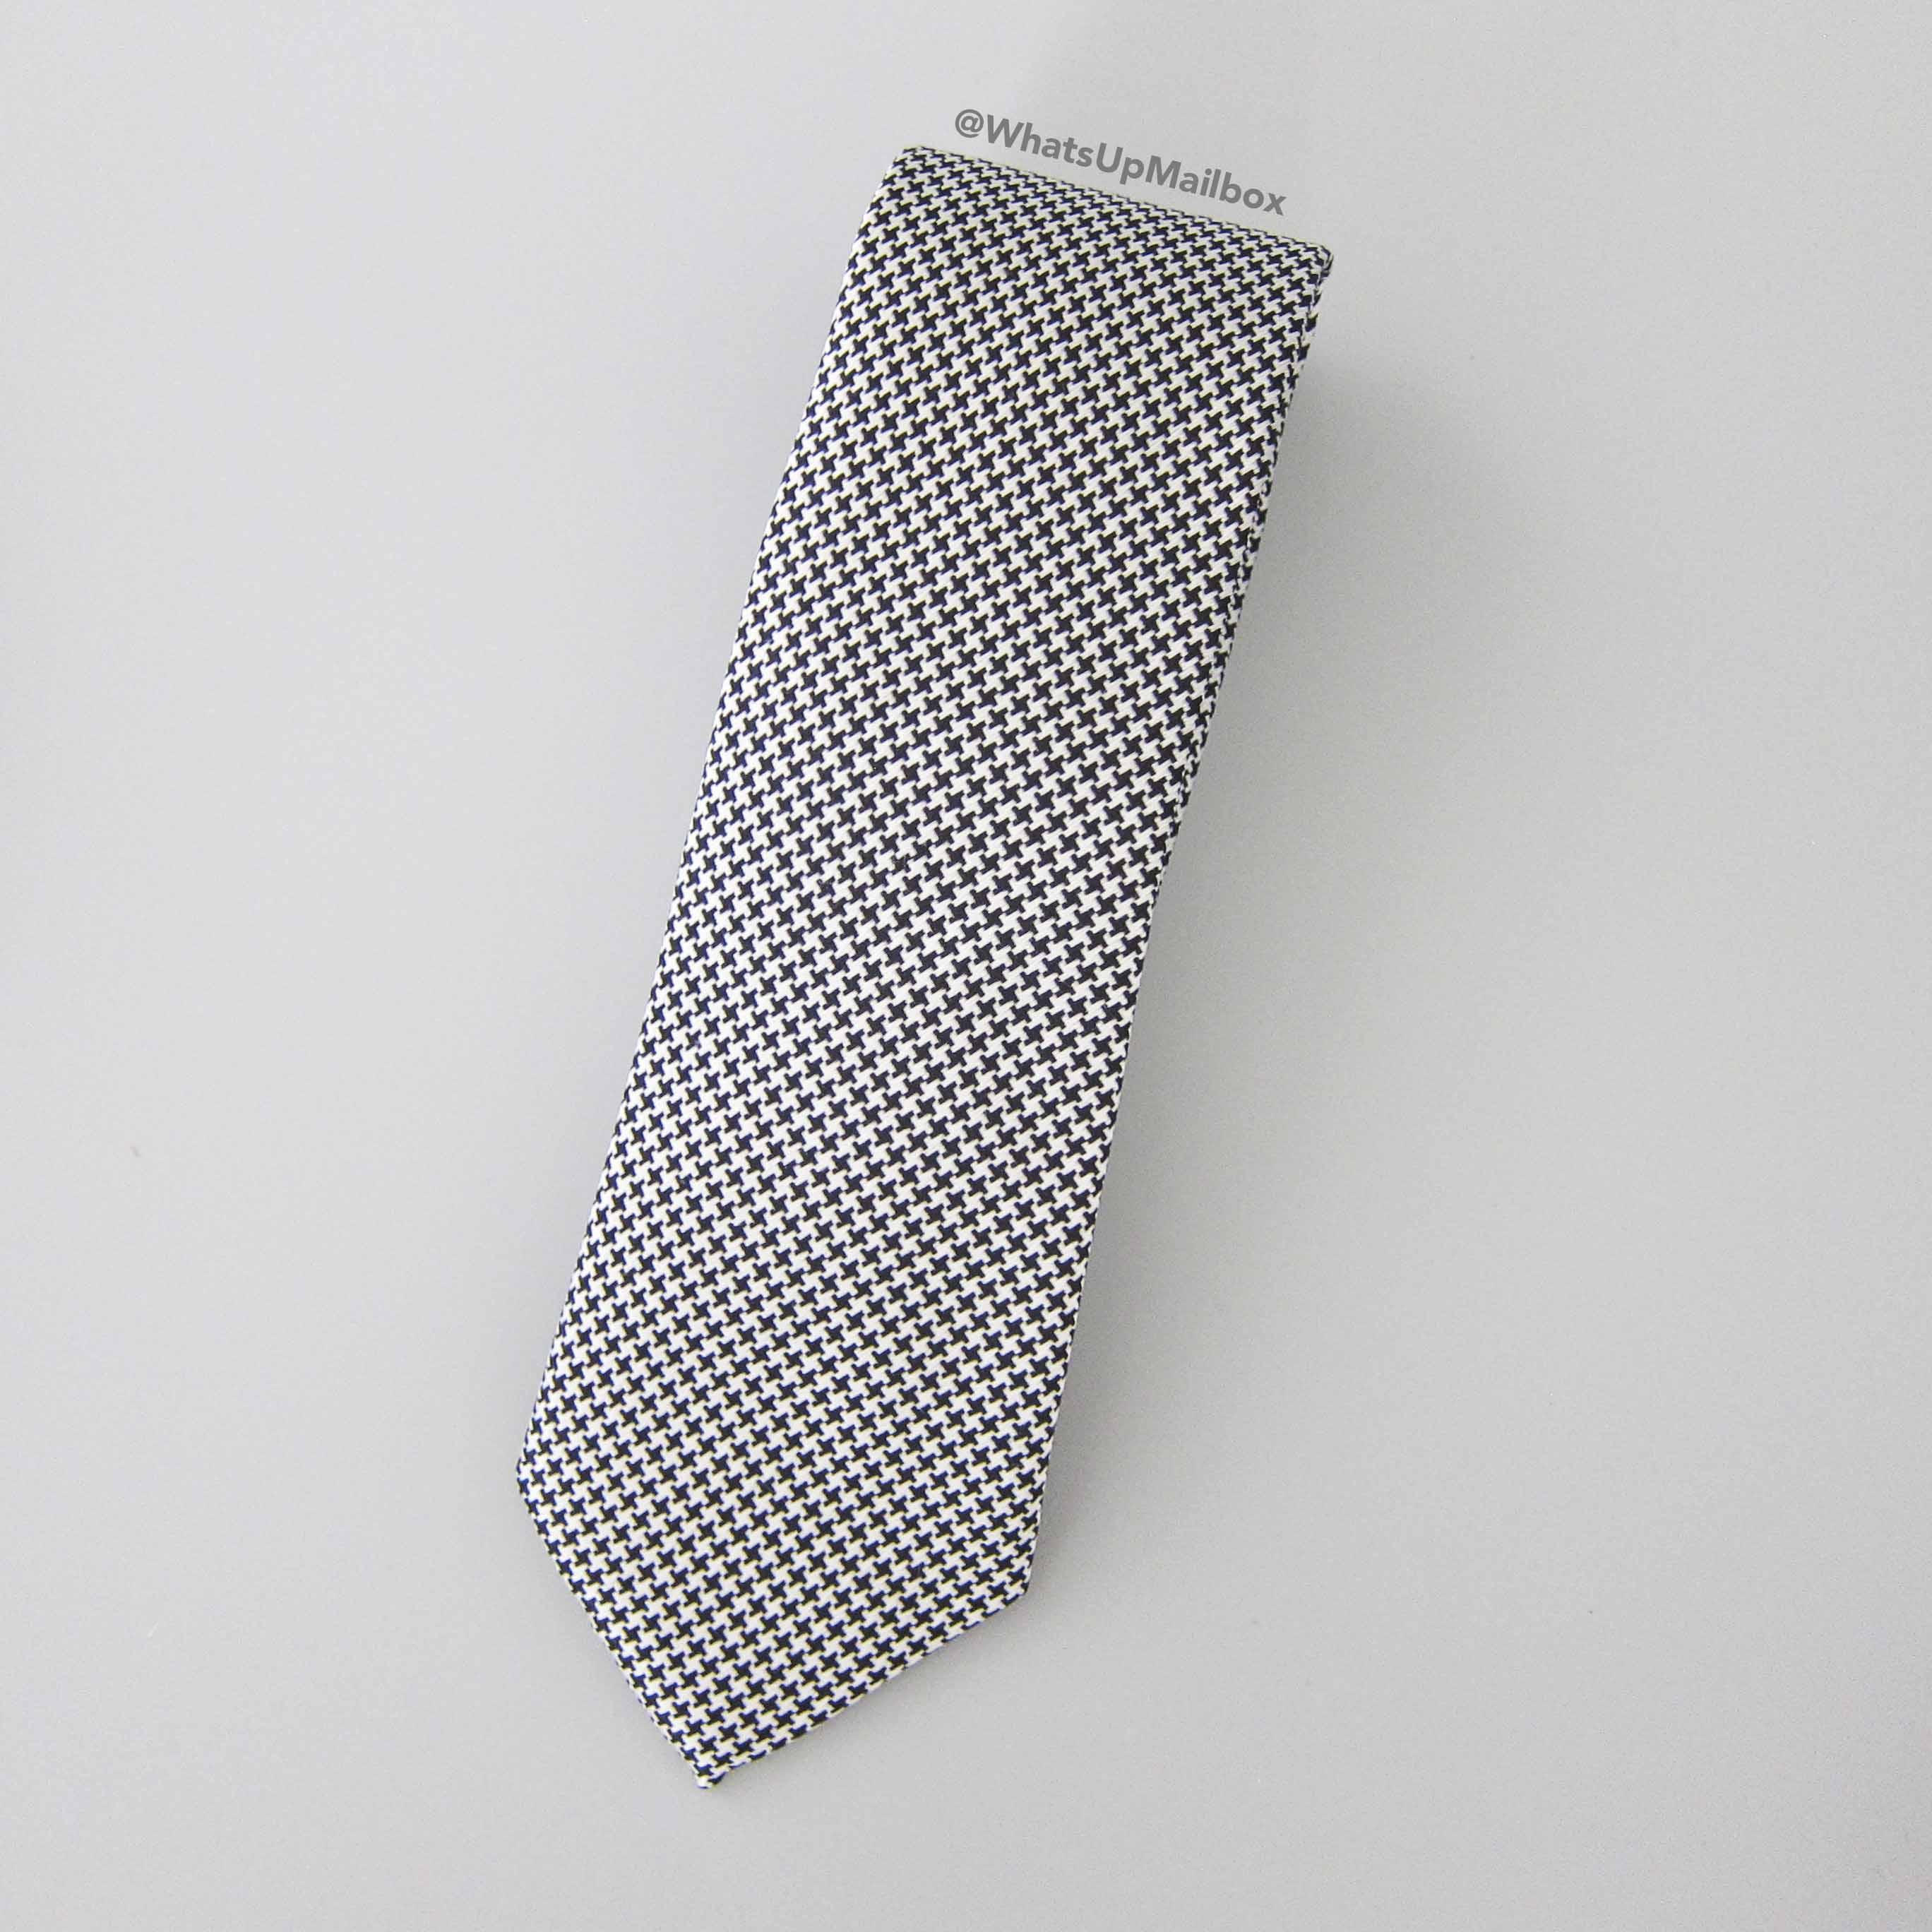 Countess Mara Neck Tie